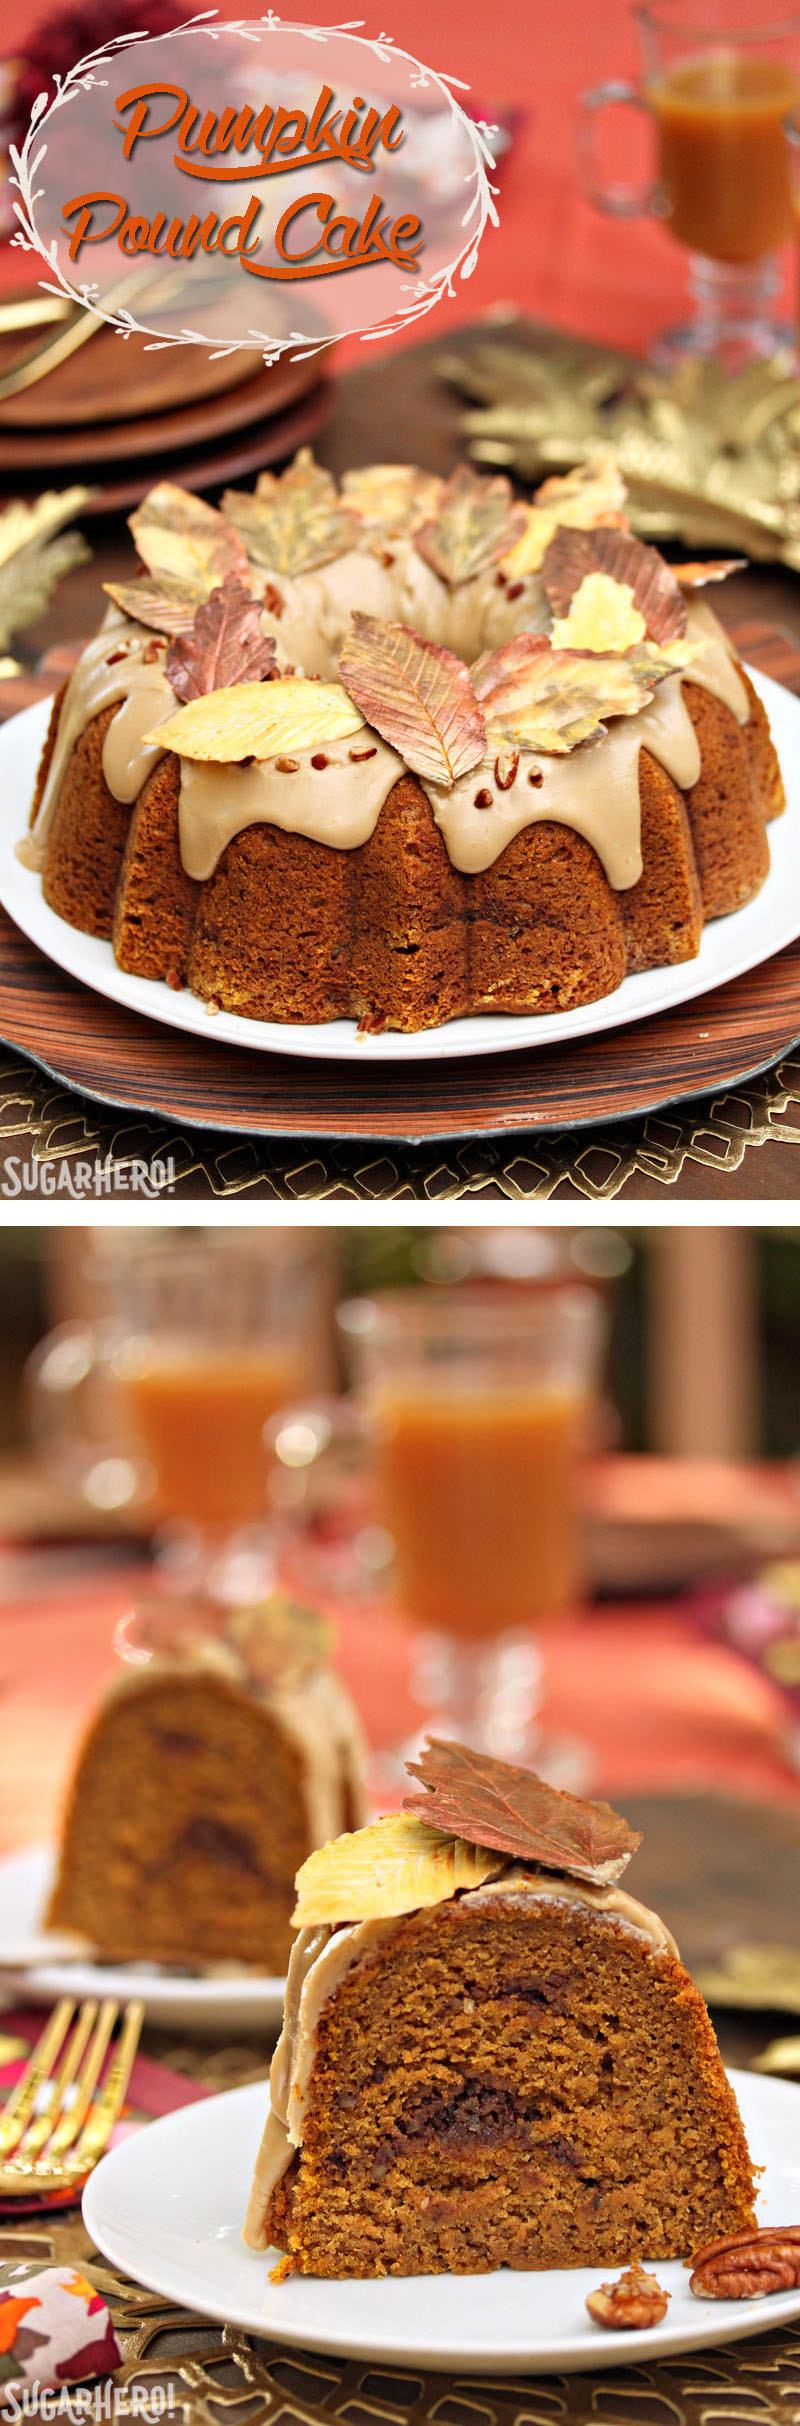 Cinnamon Swirl Pumpkin Pound Cake   From SugarHero.com